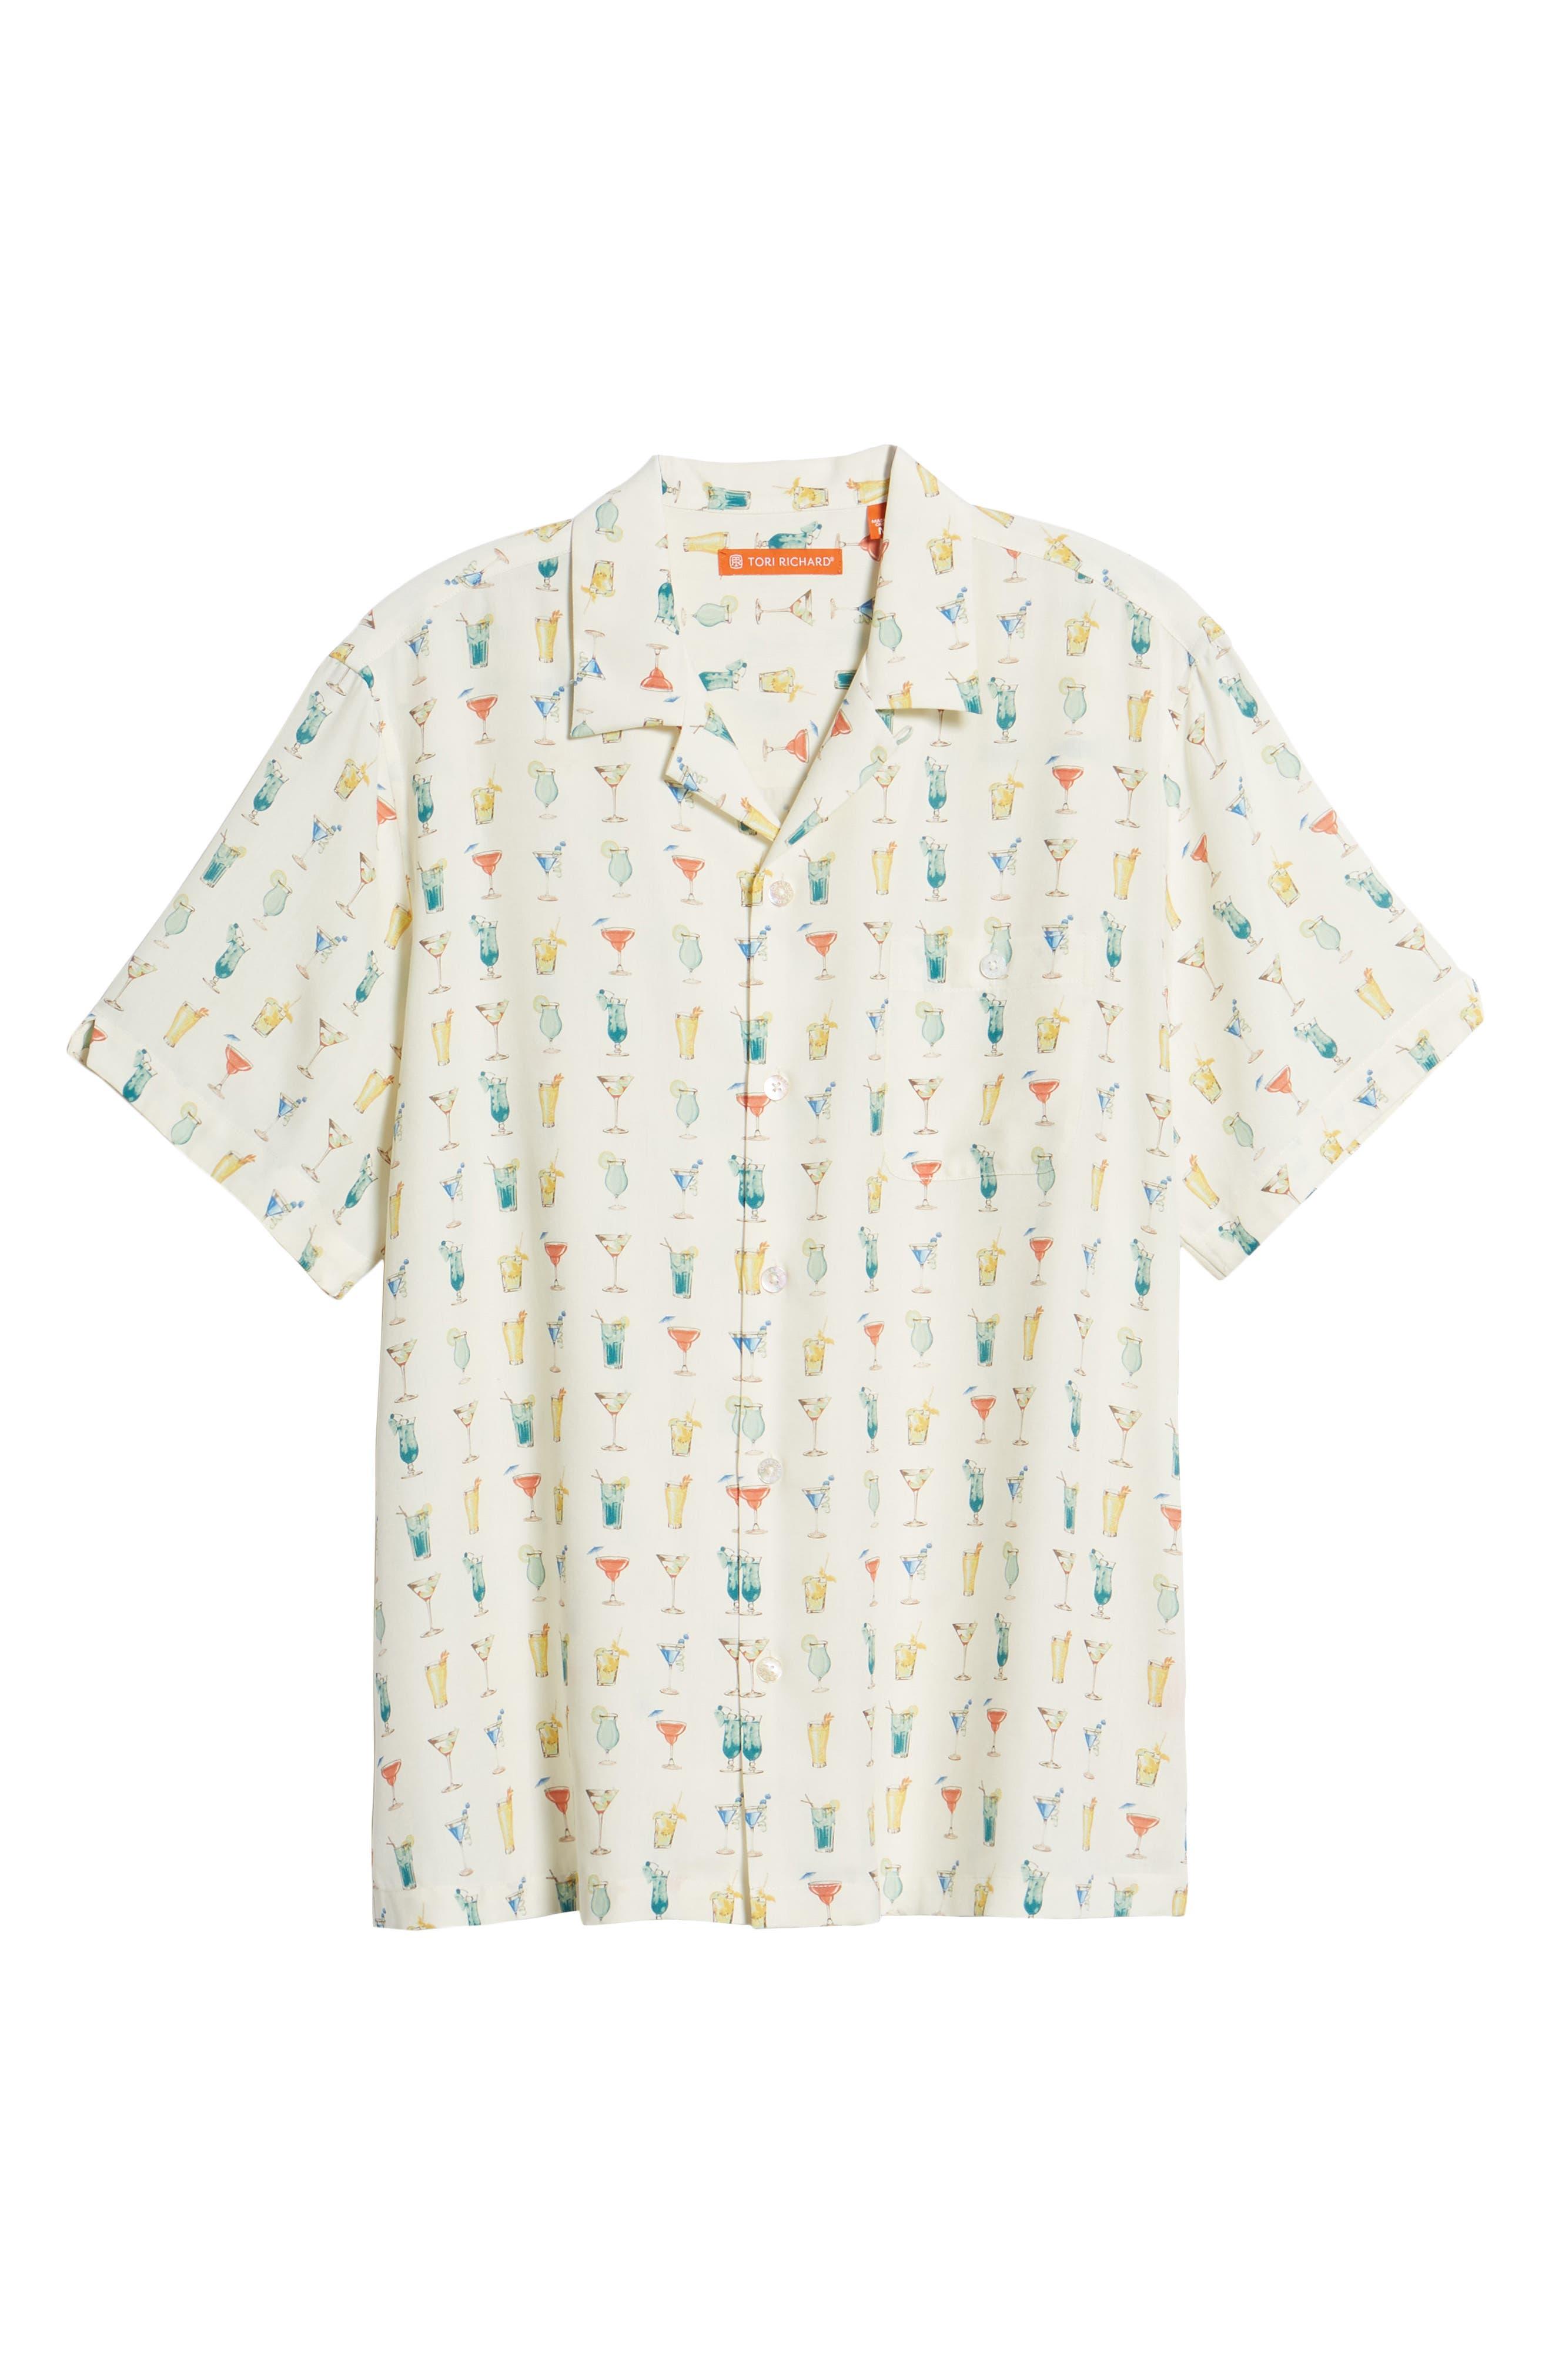 Mixalot Trim Fit Silk Blend Camp Shirt,                             Alternate thumbnail 6, color,                             Off White